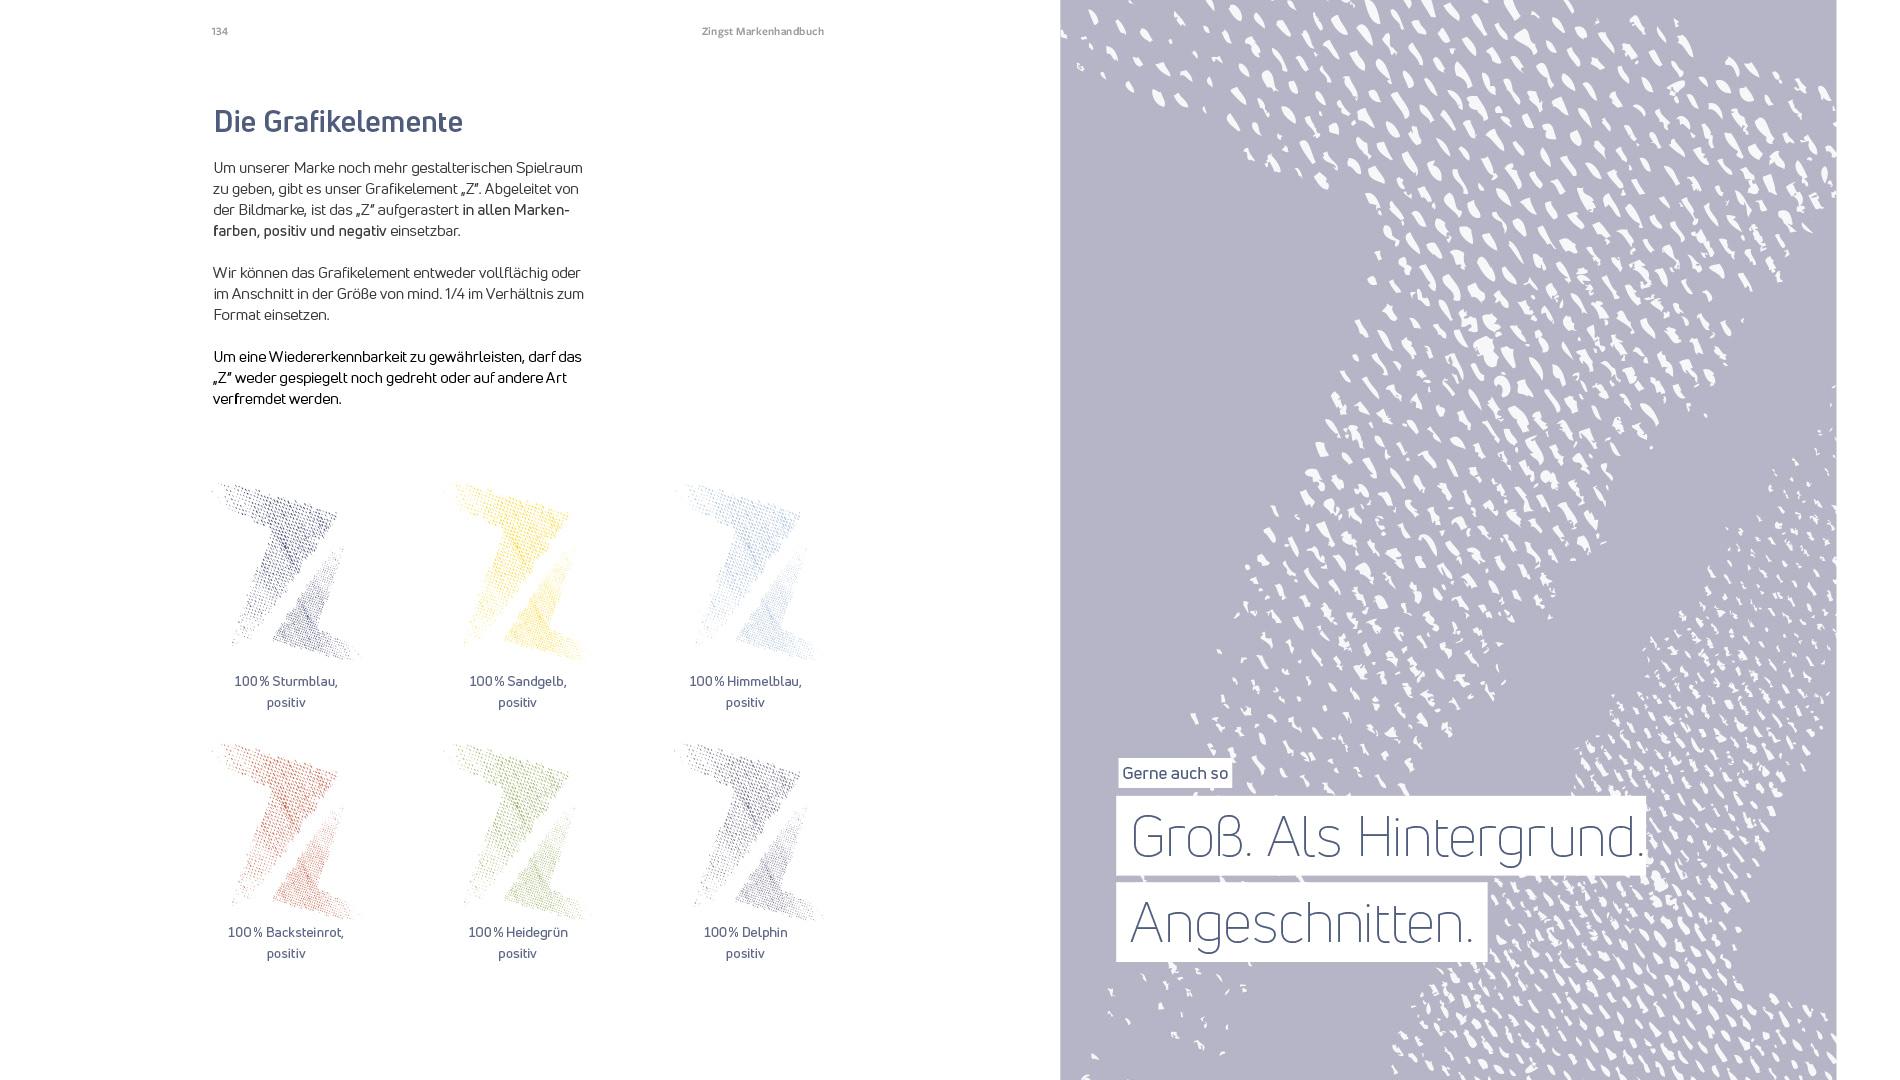 Markenentwicklung Corporate Design Zingst Marke Grafikelemente Going Places